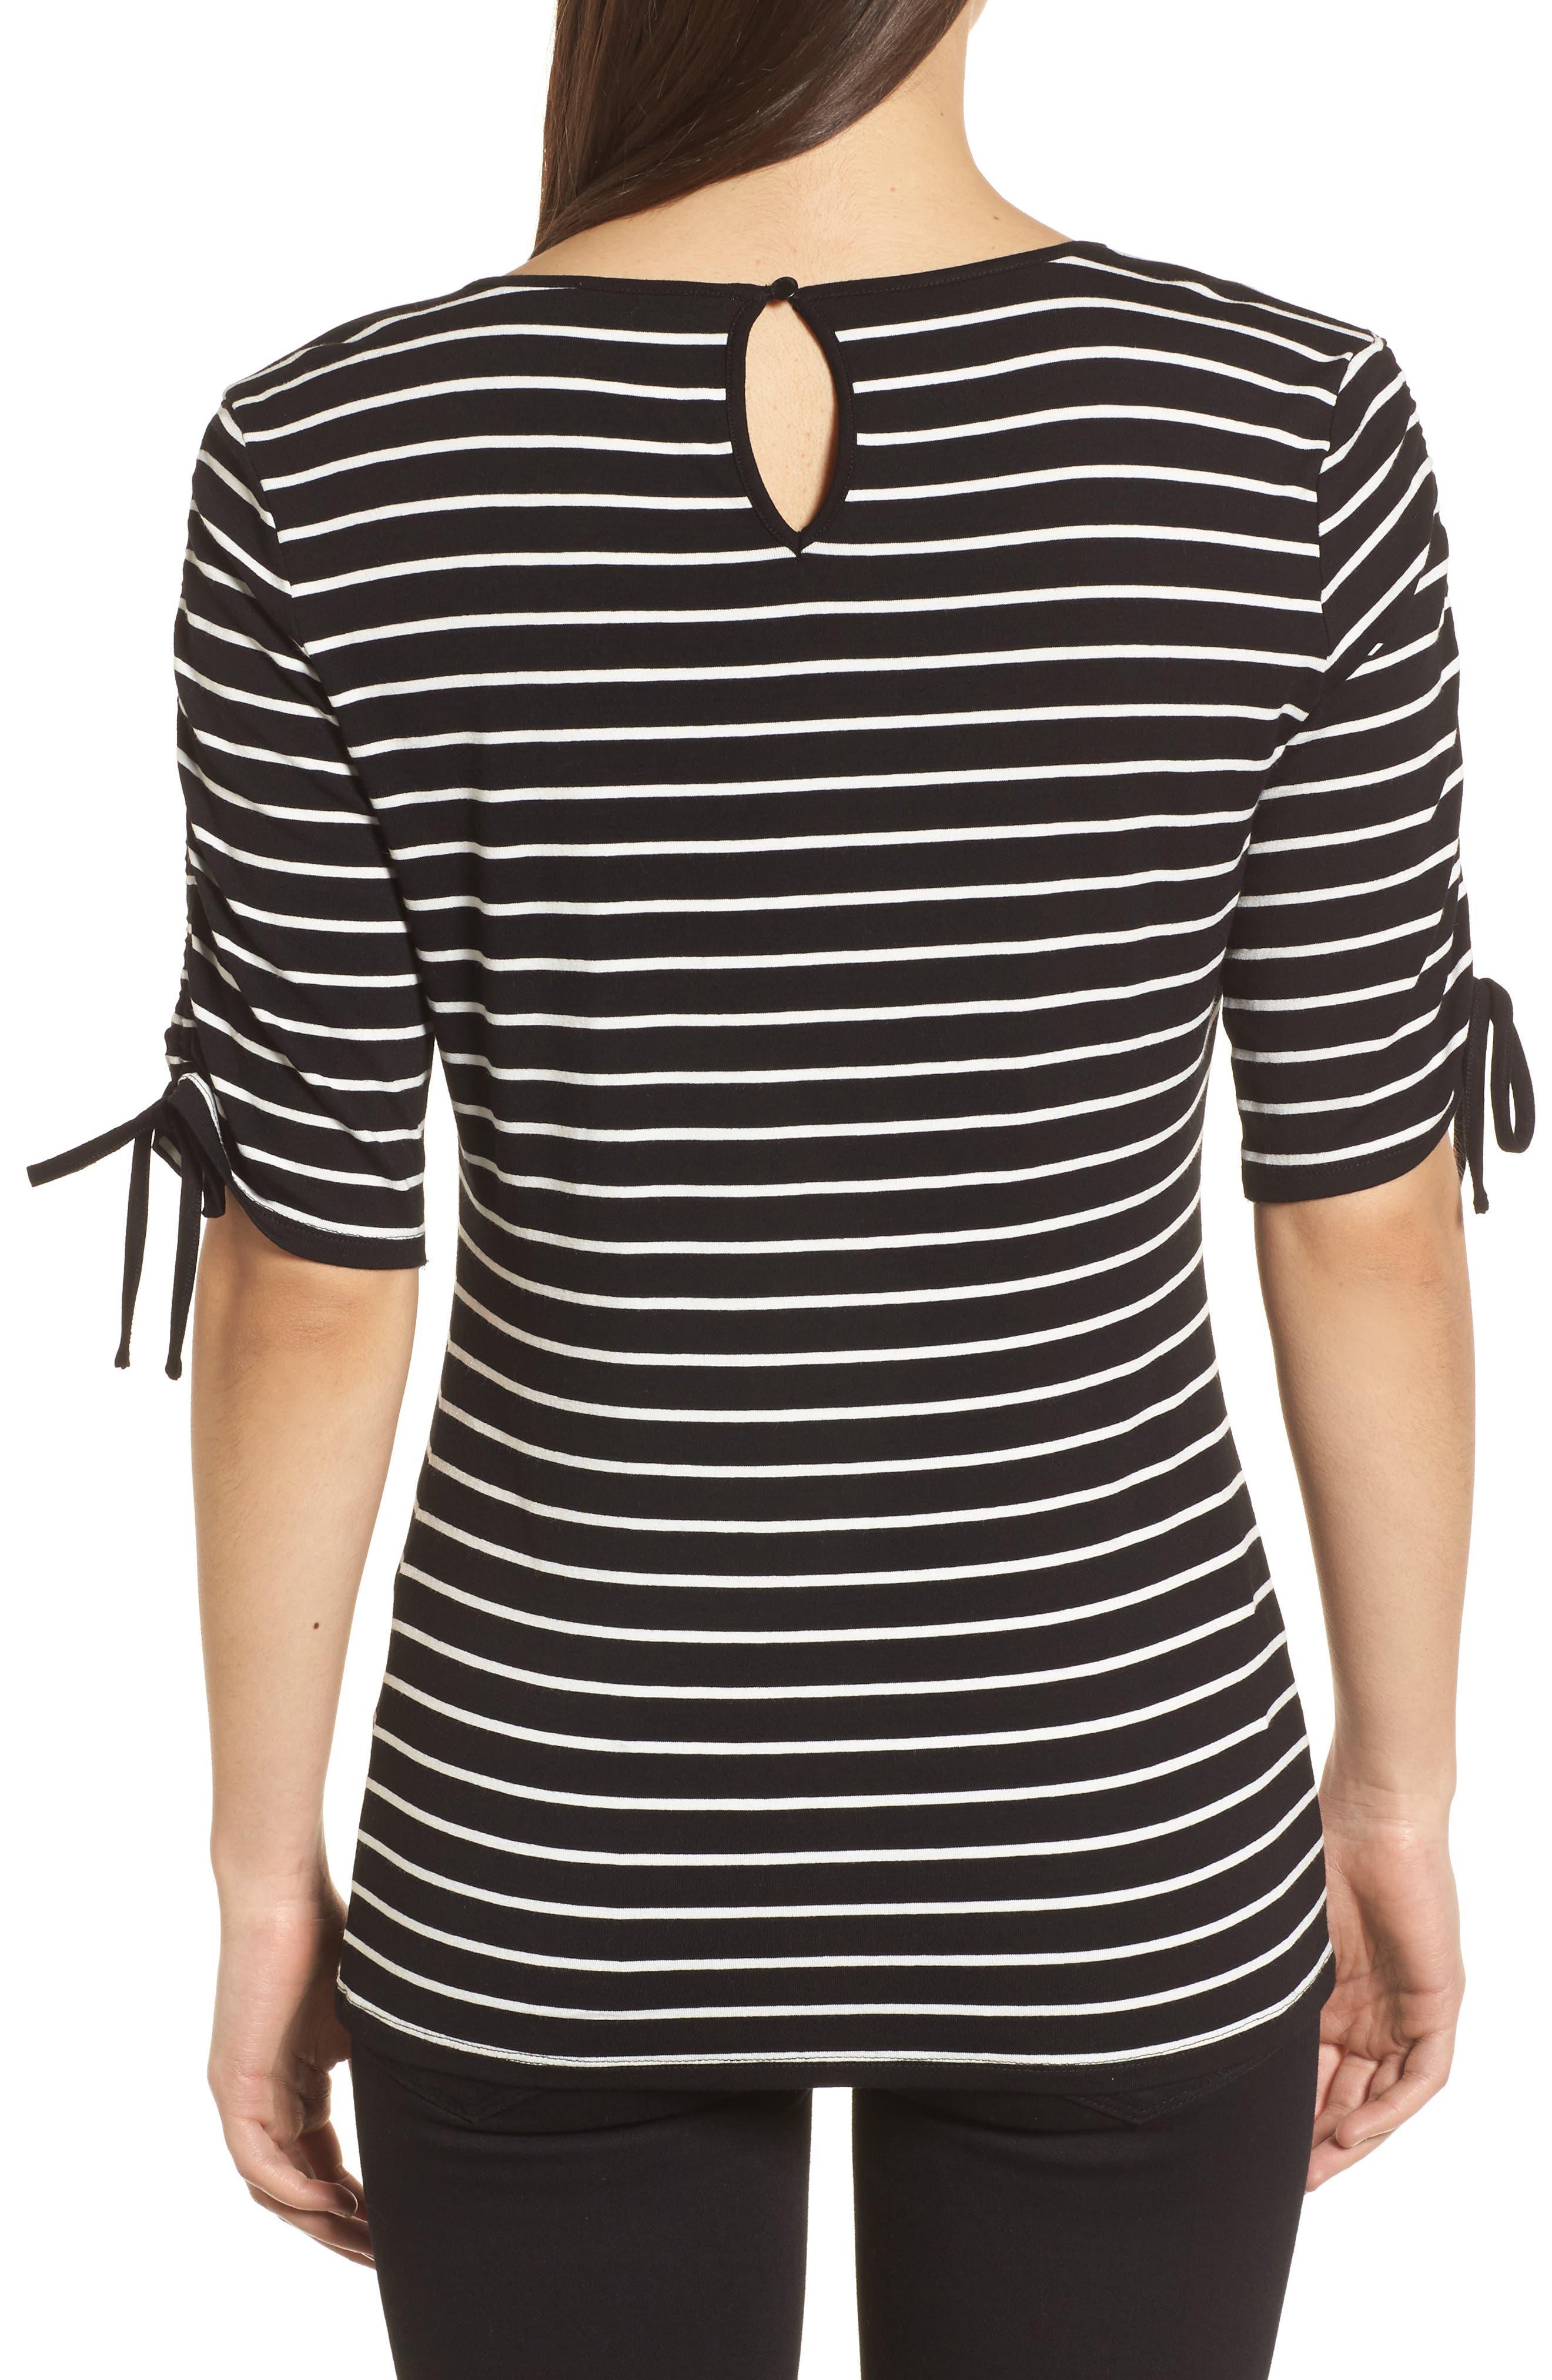 Drawstring Sleeve Stripe Top,                             Alternate thumbnail 2, color,                             006